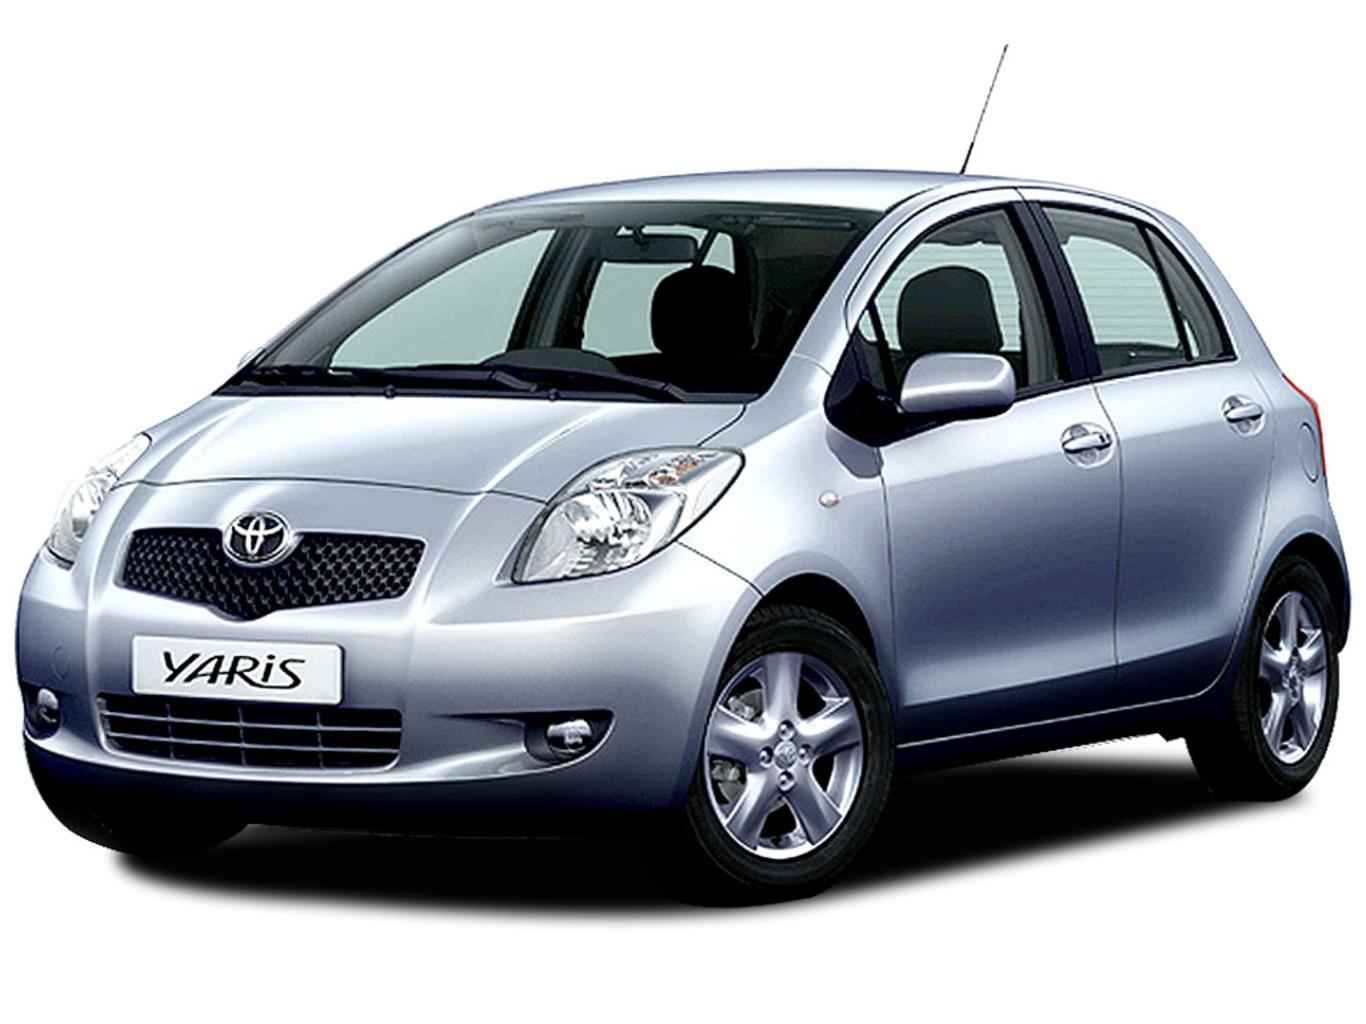 Toyota Yaris Home Car & Motorbike Rentals Wallpapers Download Free